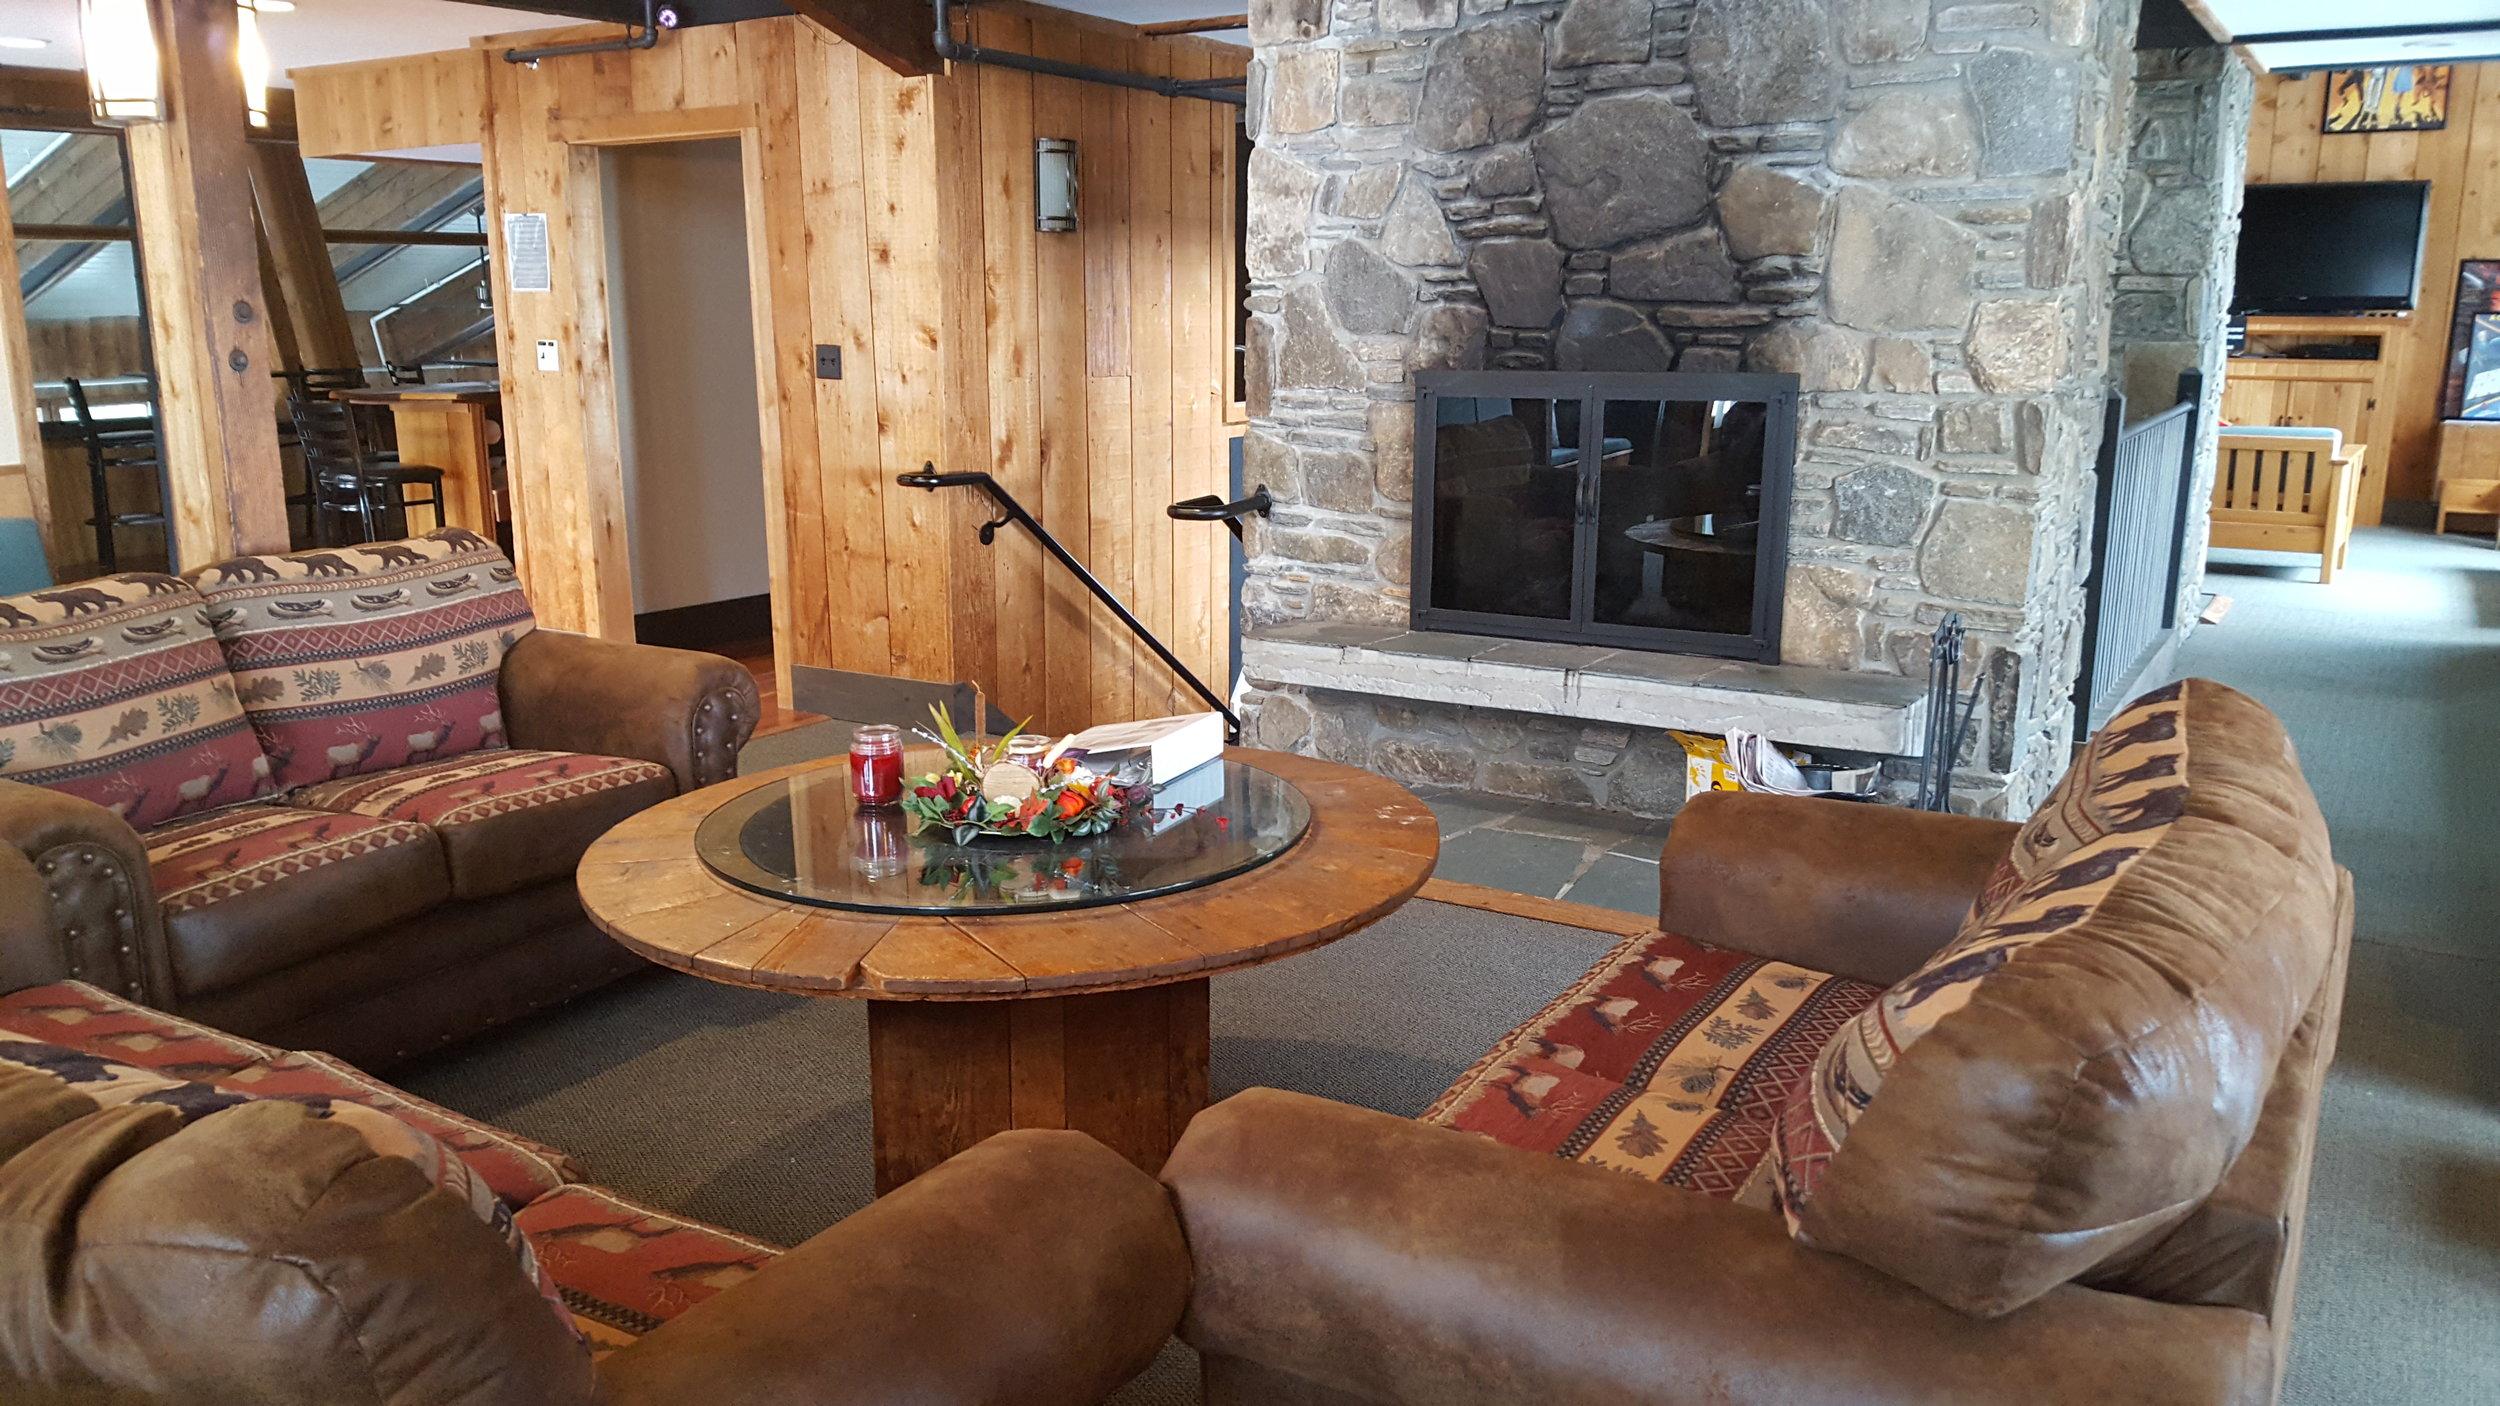 Lounge by fireplace